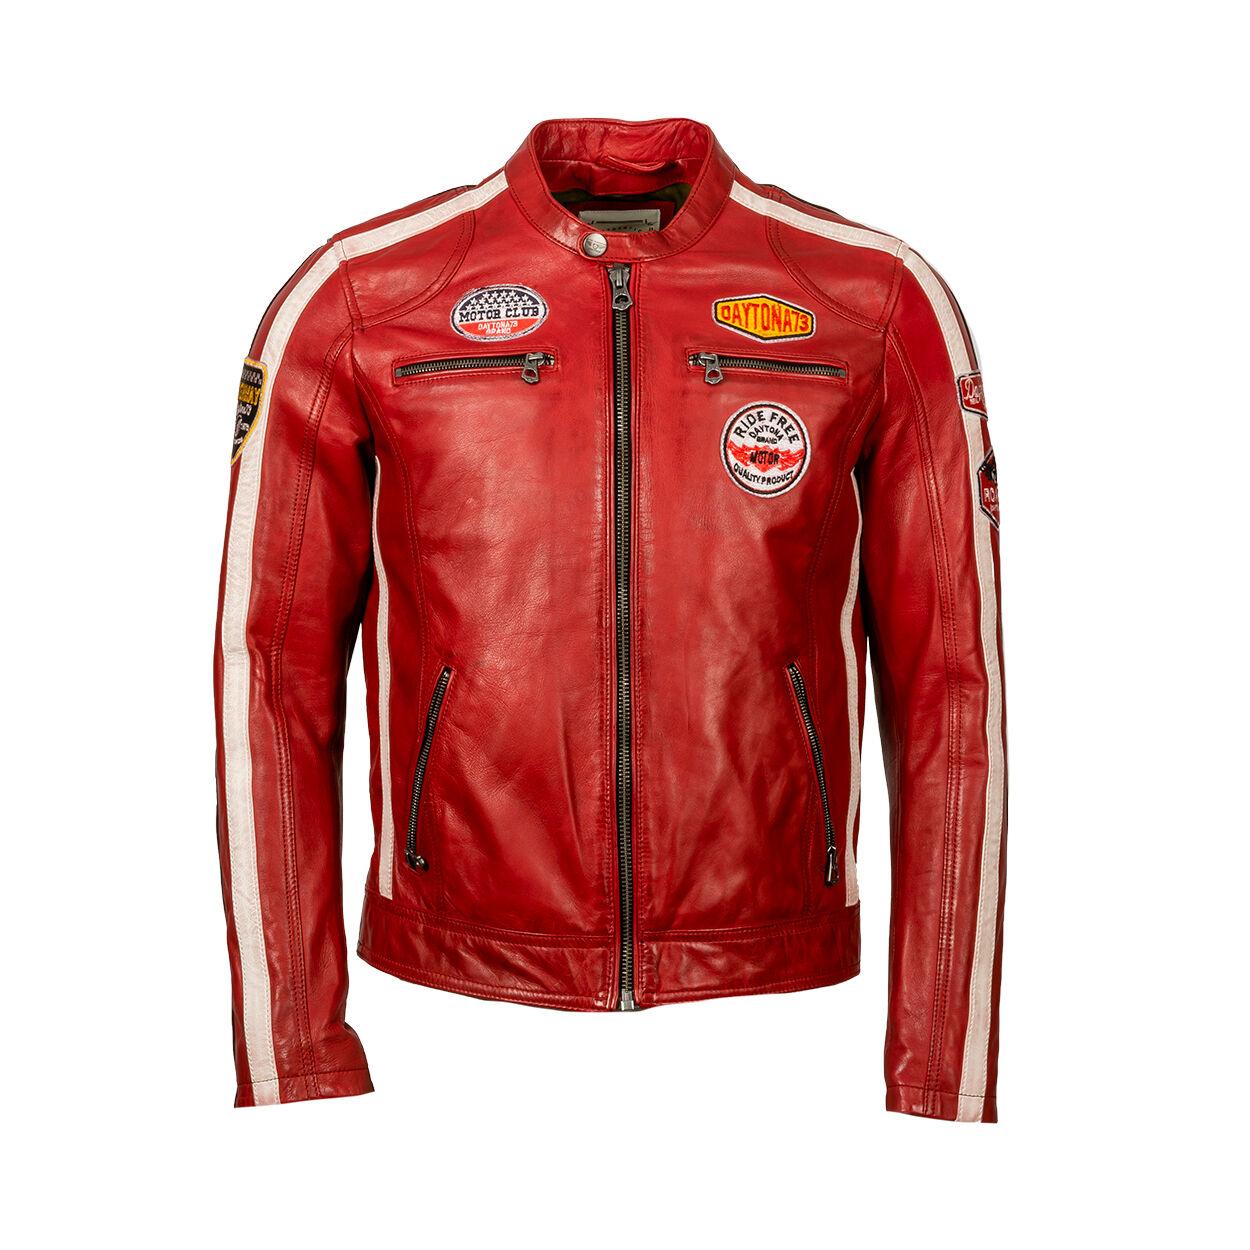 Daytona 73 Blouson motard Daytona73 Nentley en cuir rouge - ROUGE -